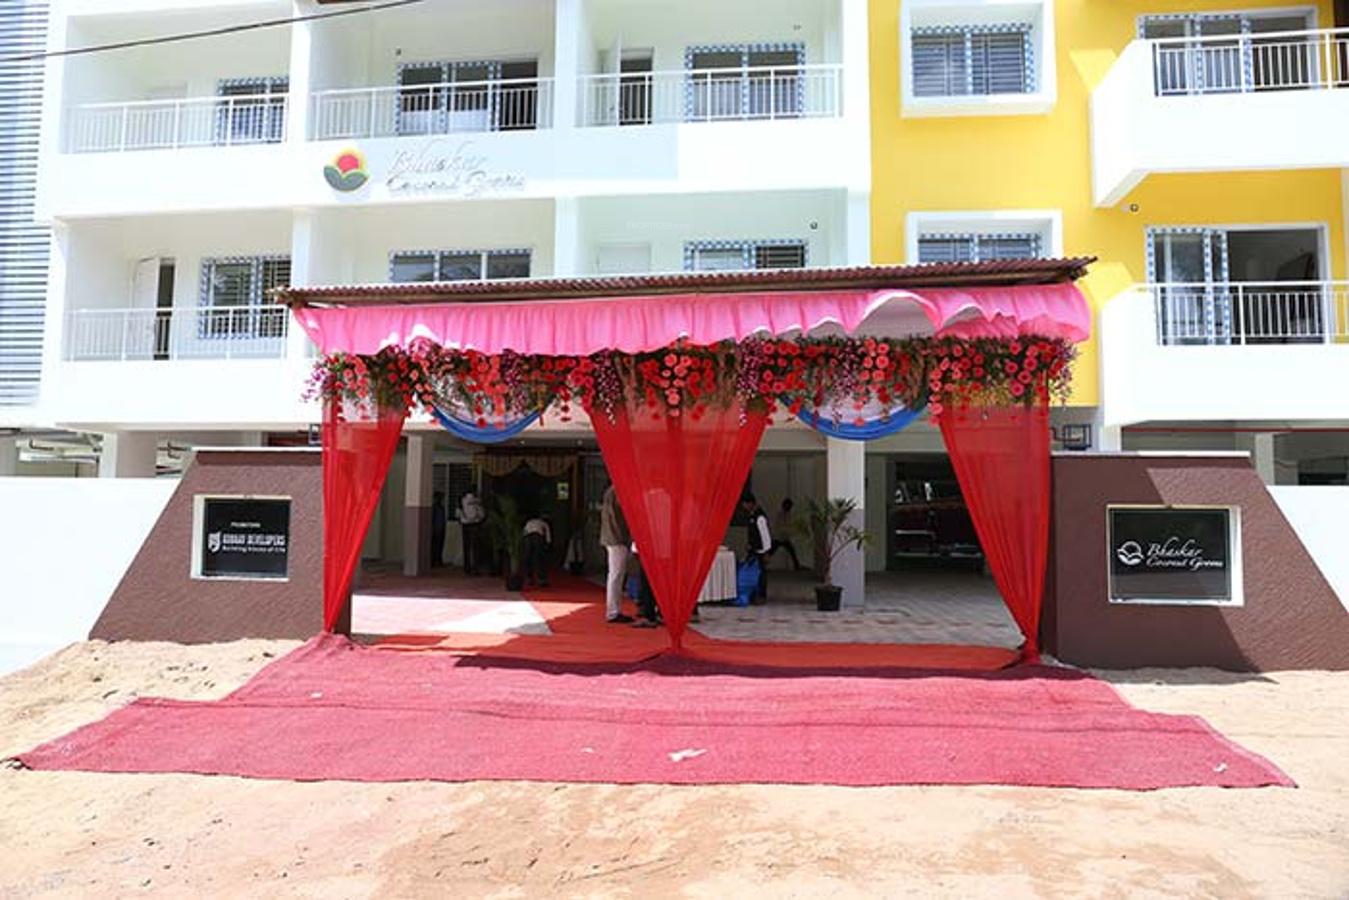 Udbhav Bhaskar Coconut Groves in Bendoor, Mangalore - Price